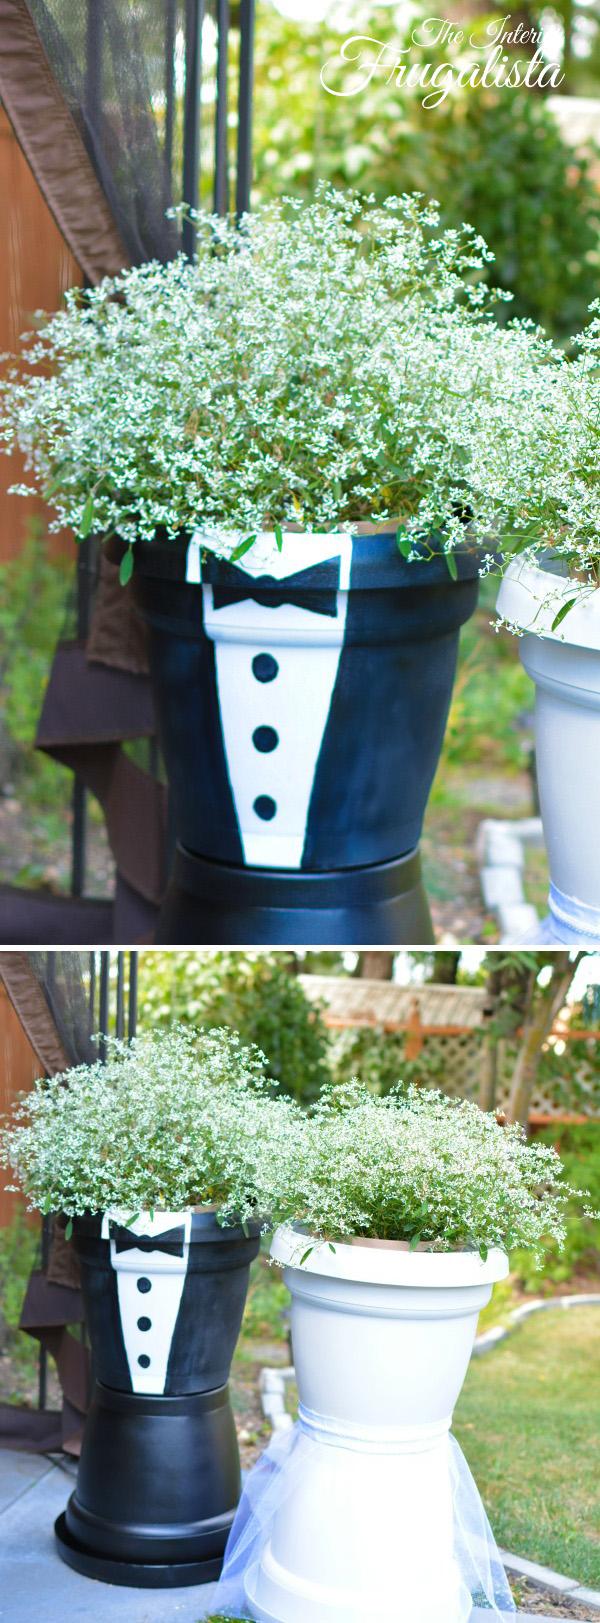 diy-wedding-ceremony-groom-flower-pot.jpg